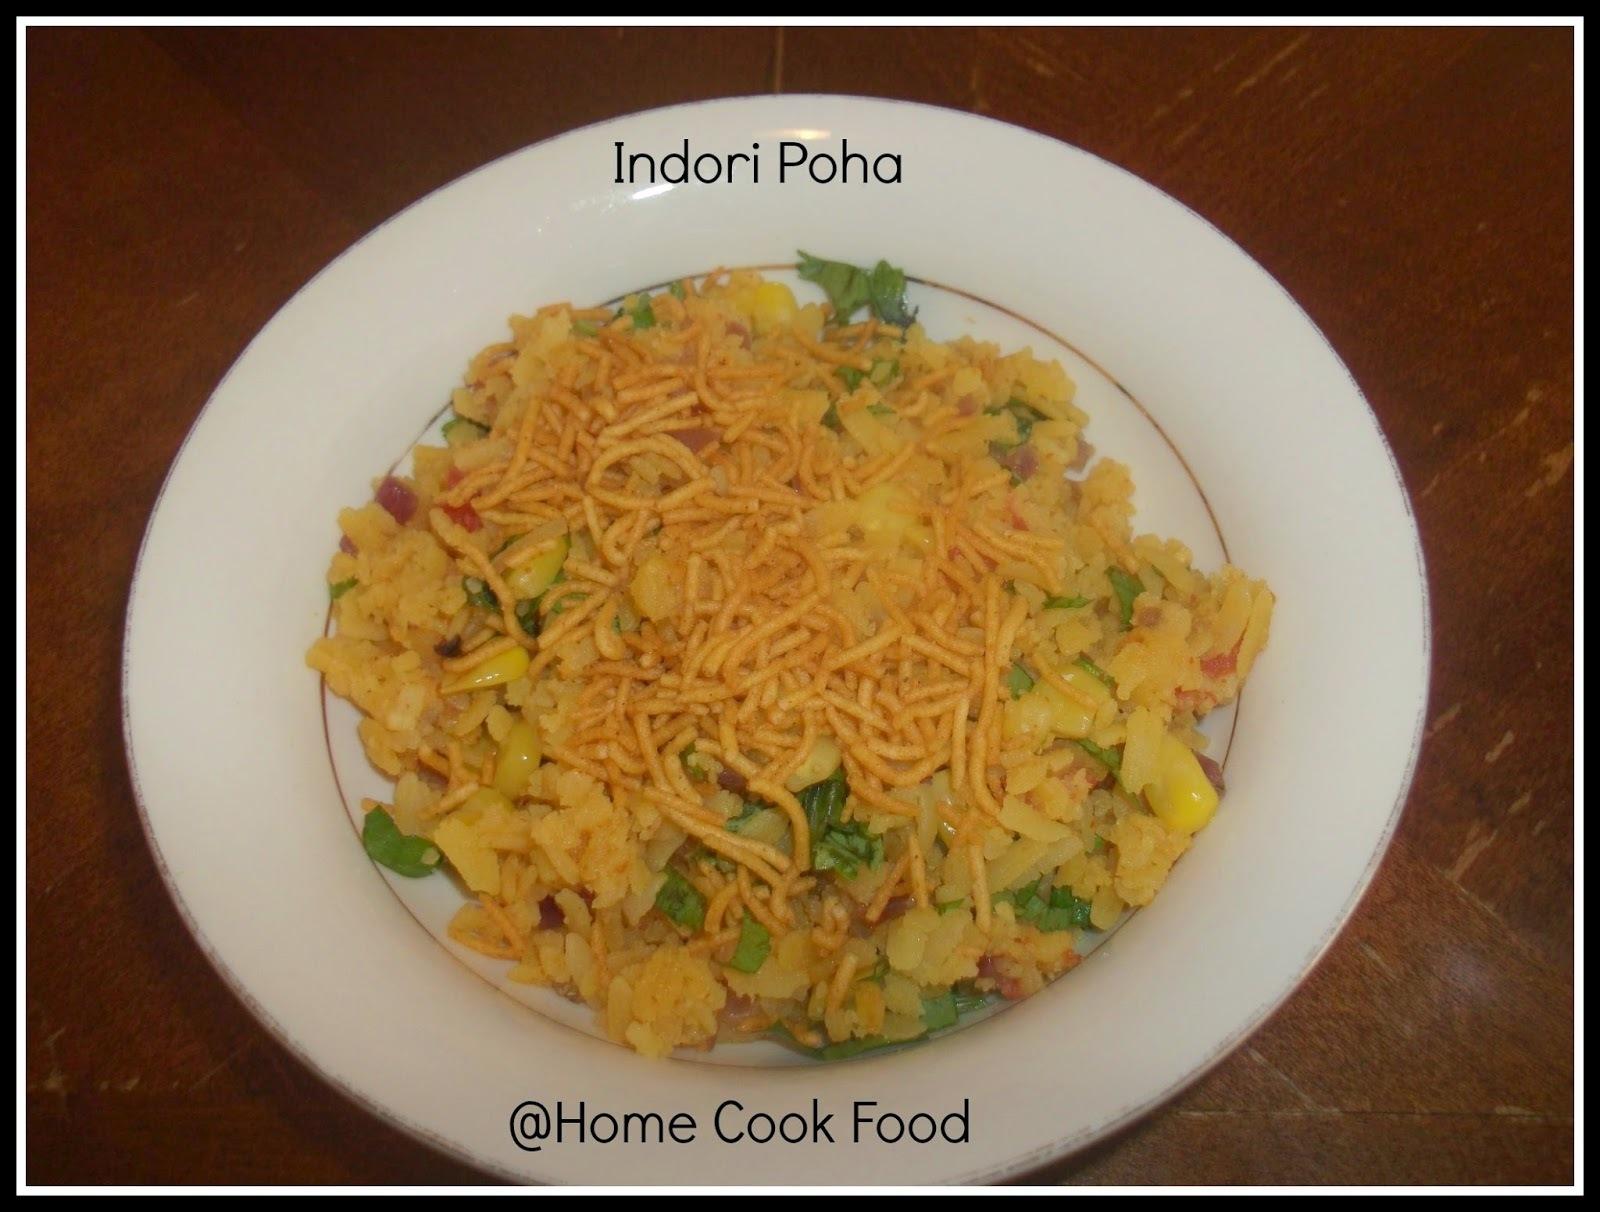 Indori Poha (Indore style Poha) Flatten rice dish